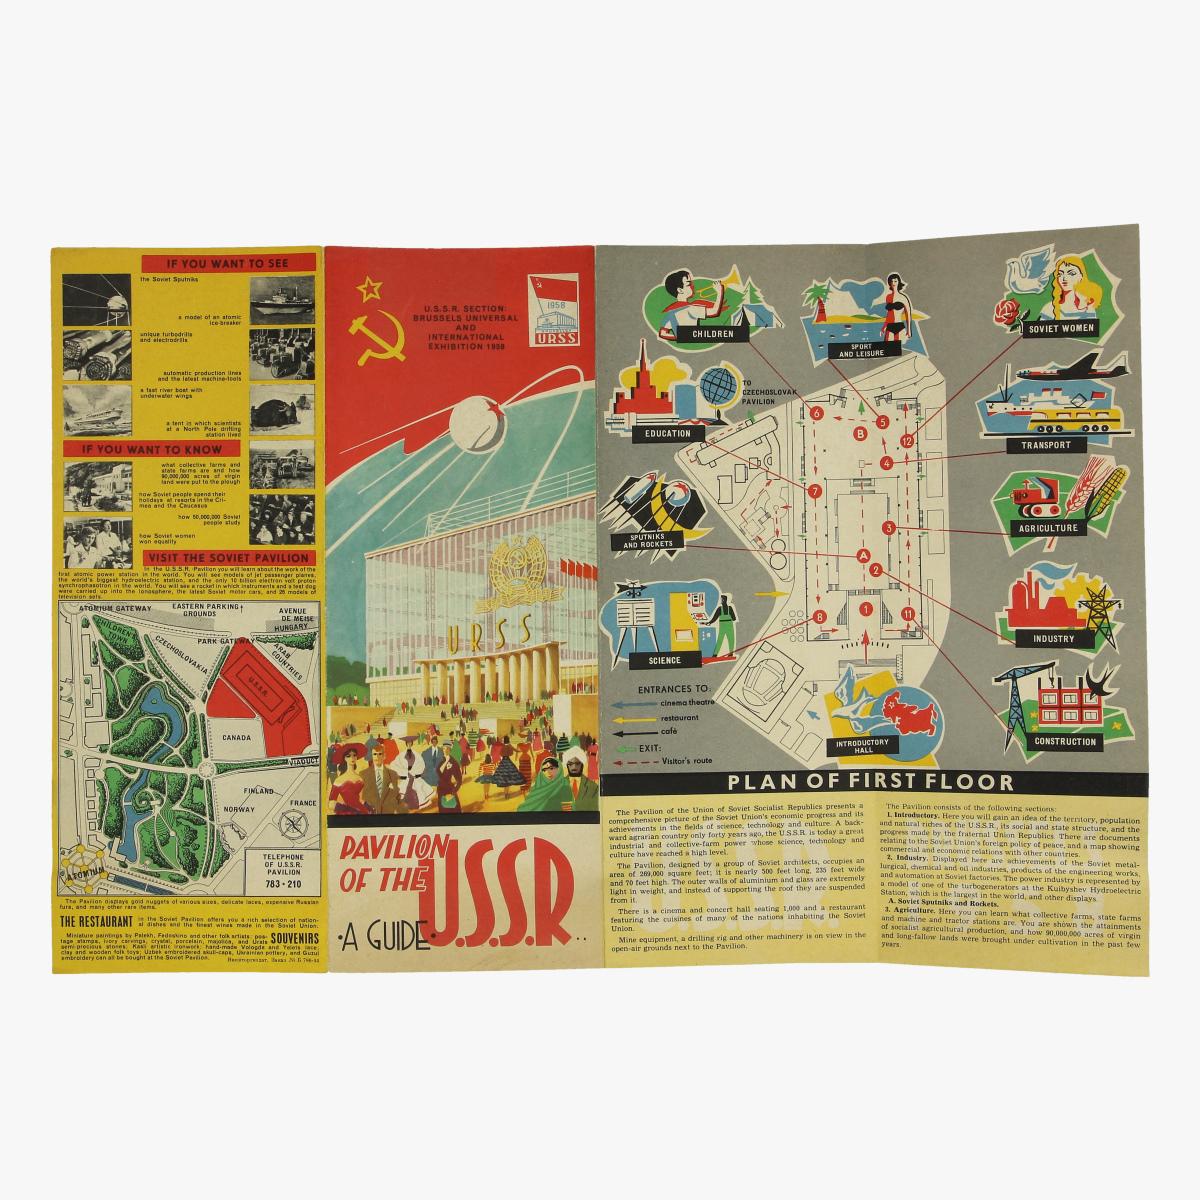 Afbeeldingen van expo 58 a guide pavilion of the u.s.s.r. 1958